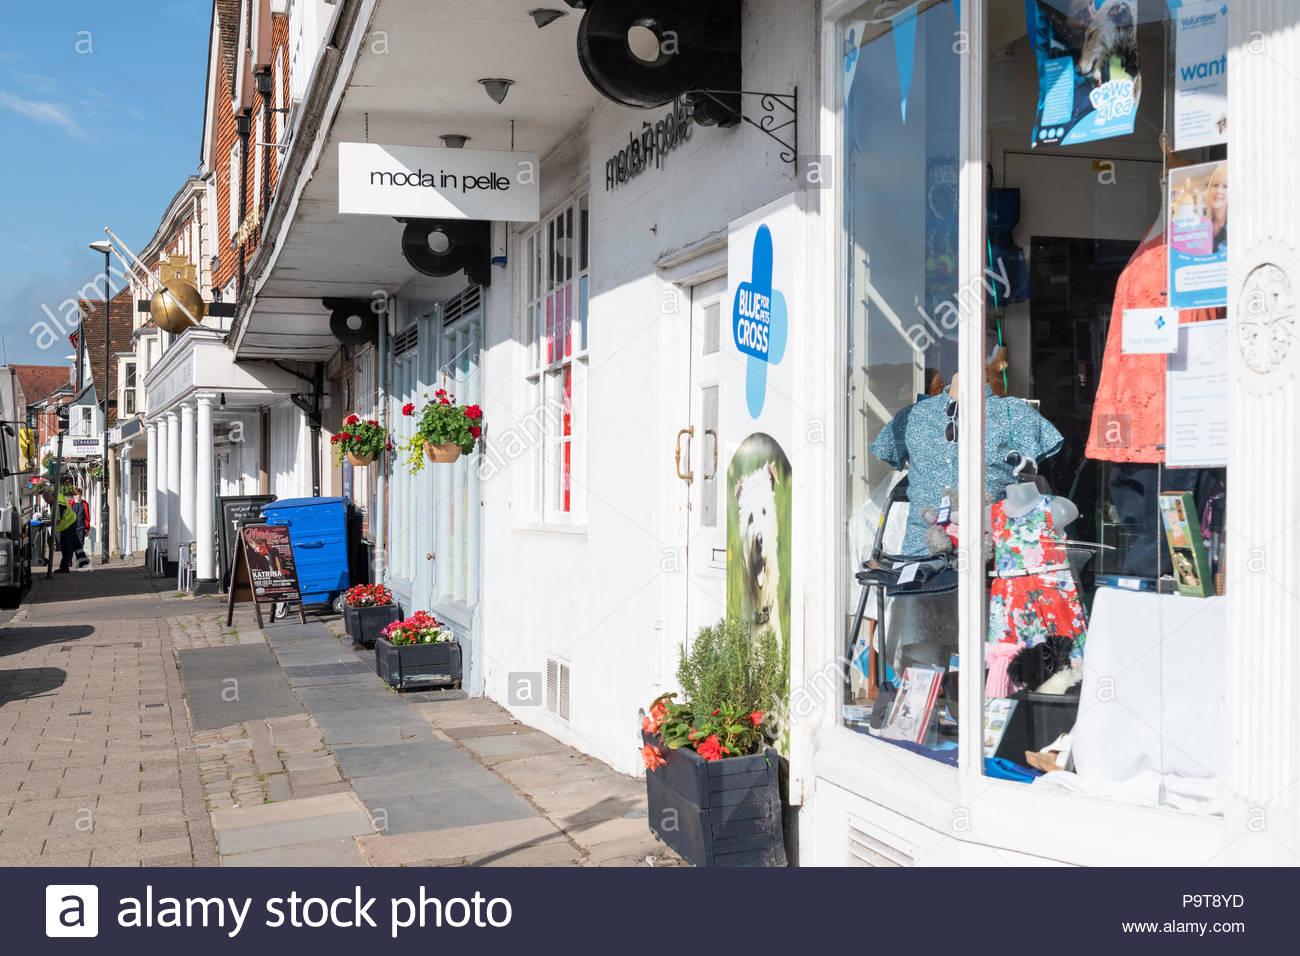 High Street stores, Marlborough, Wiltshire, England, UK Stock Photo